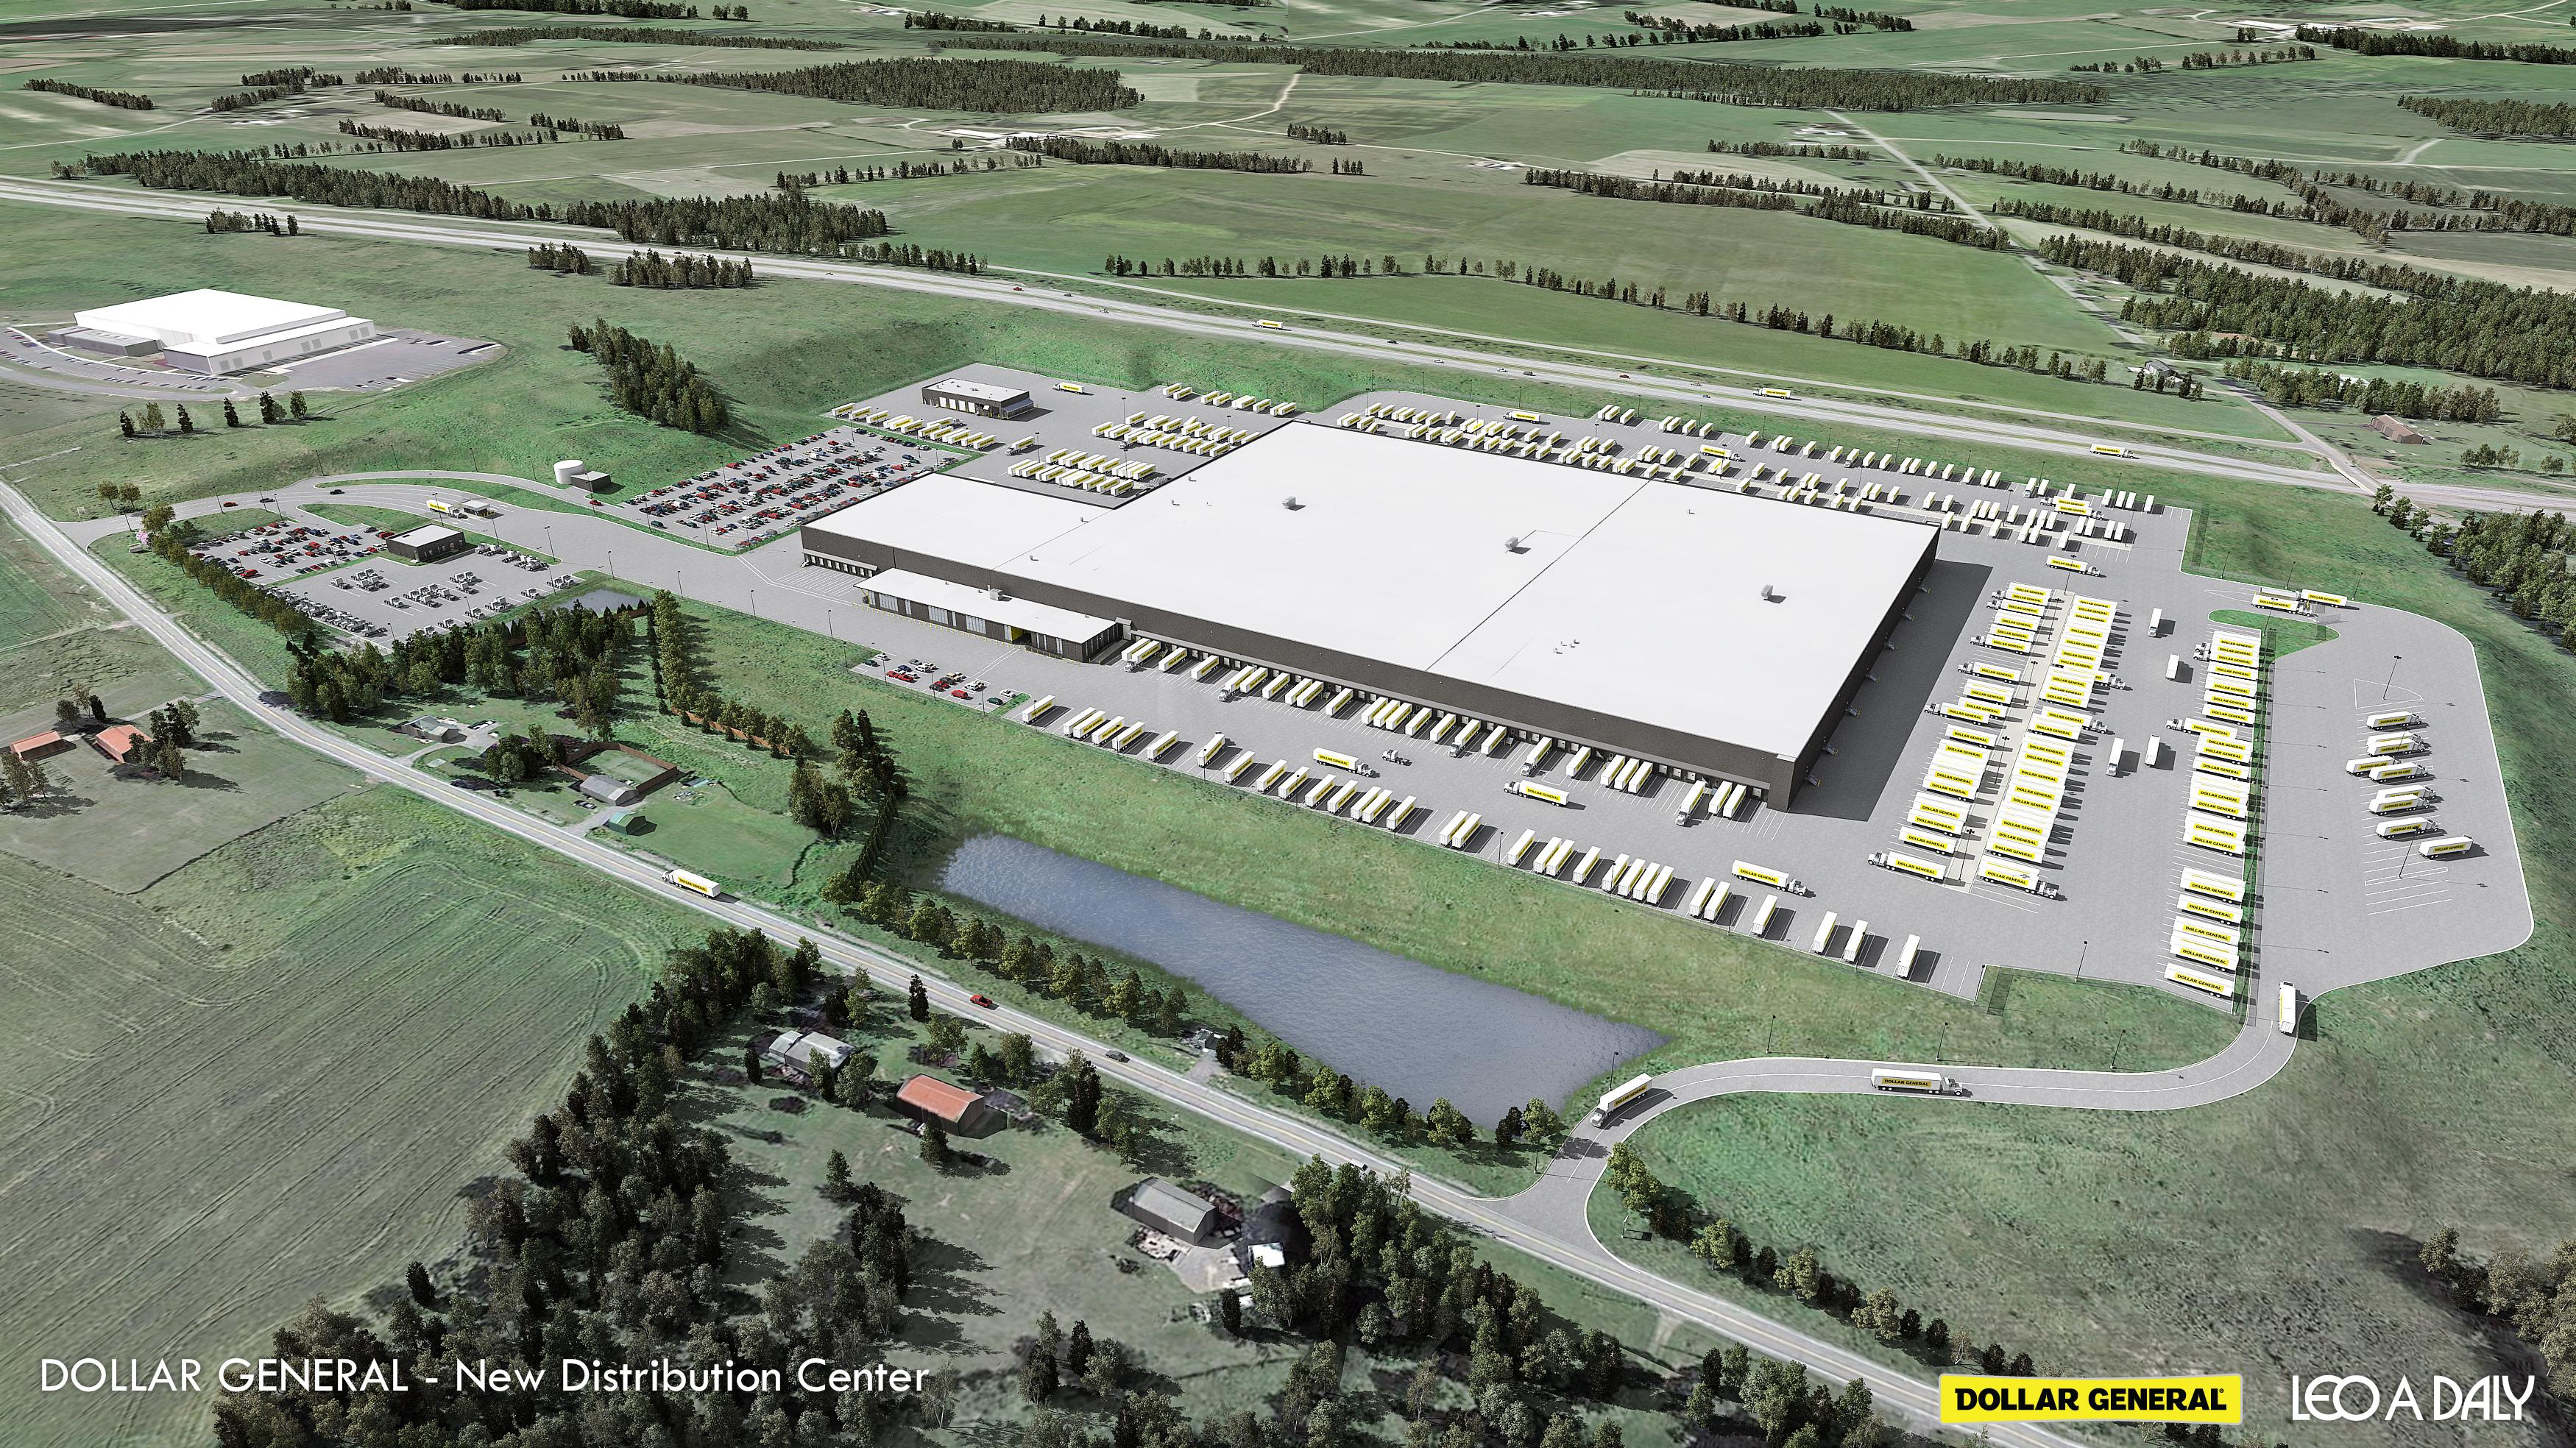 Dollar General Announces Plans For New York Distribution Center